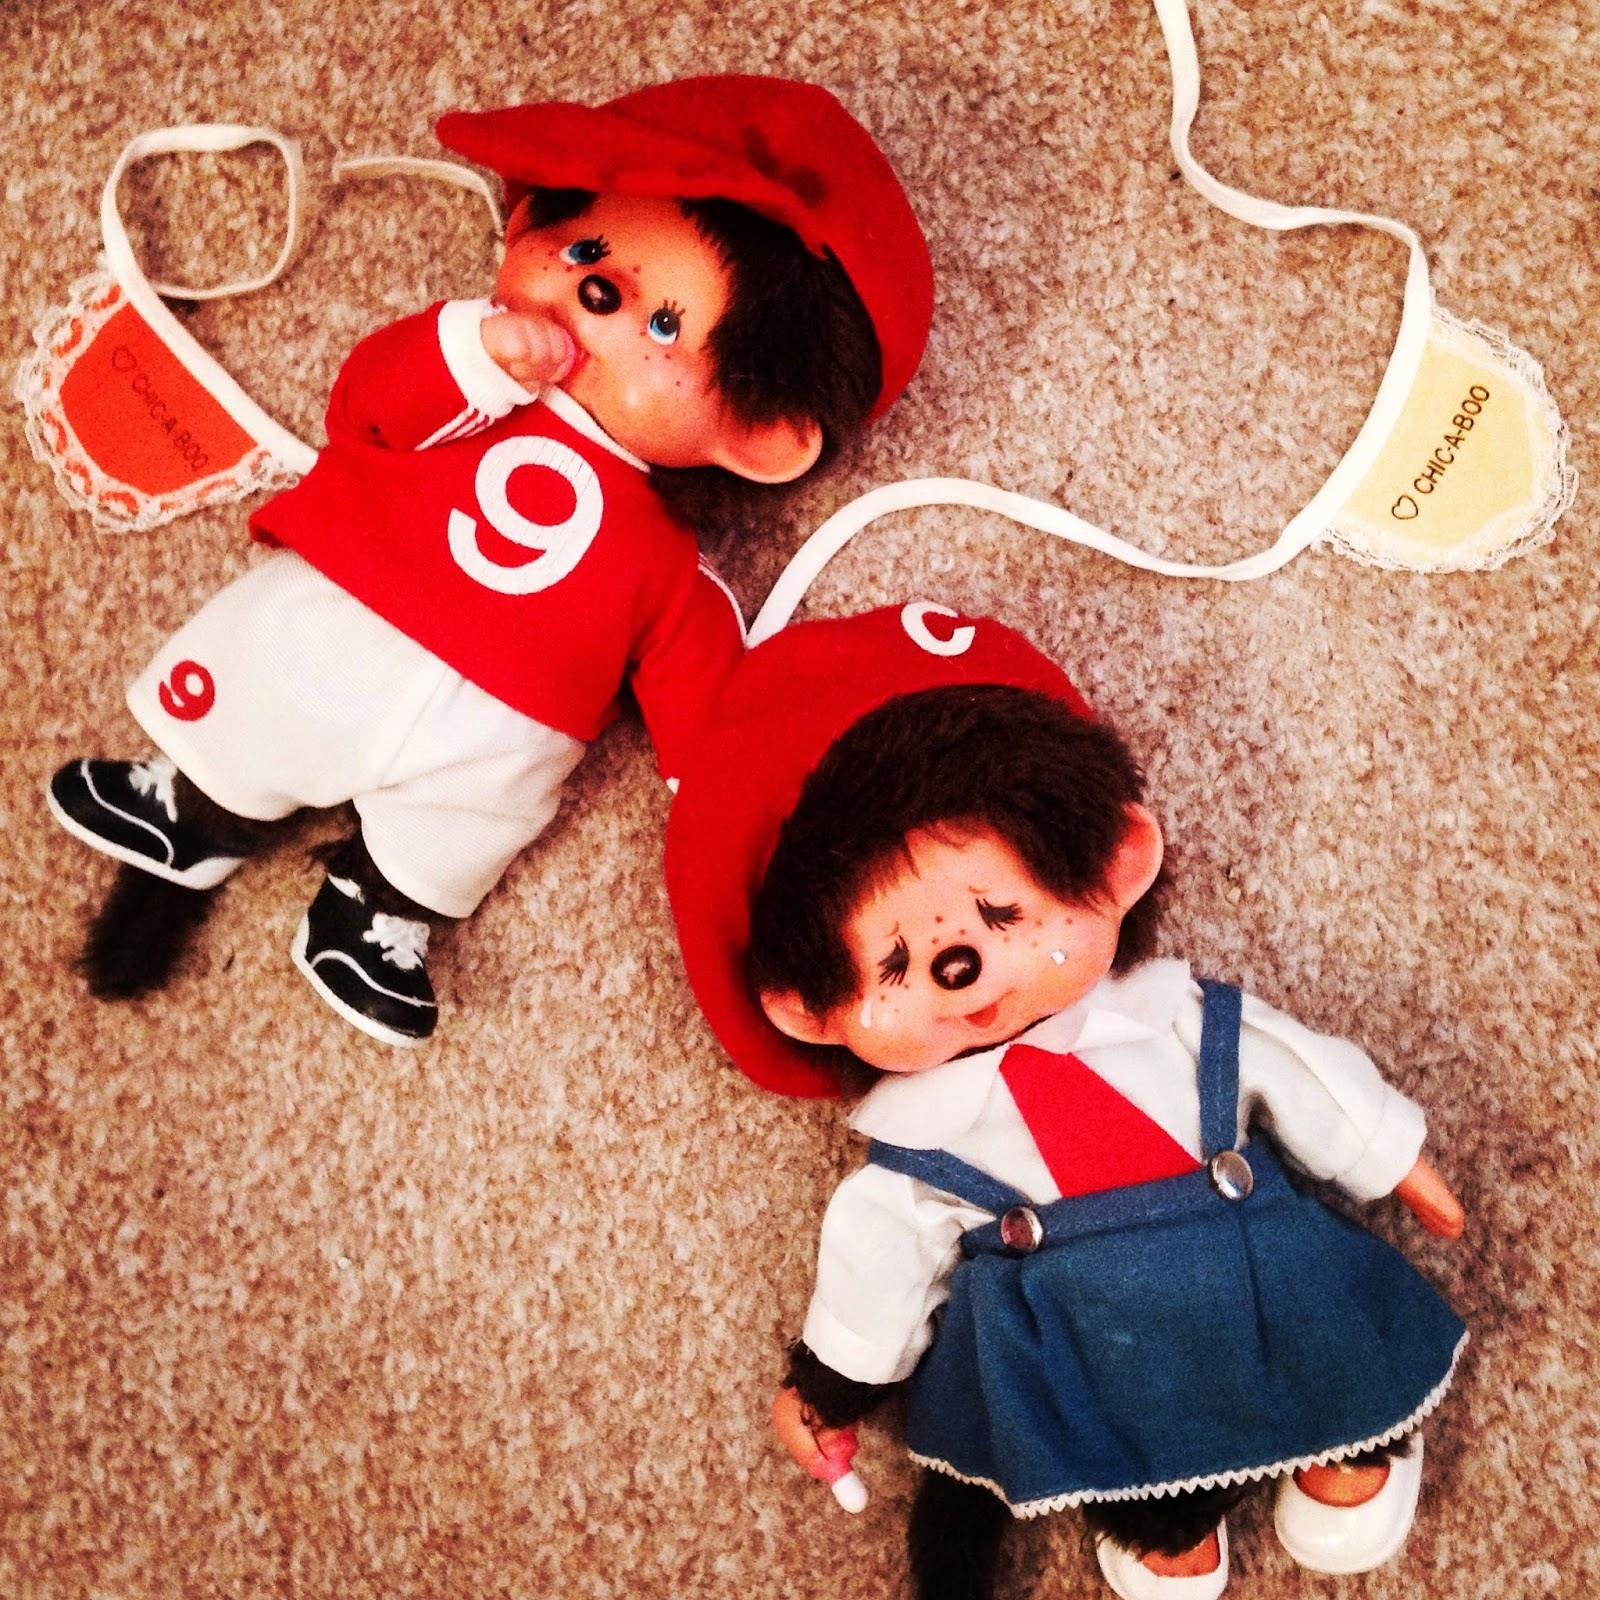 mamasVIB | V. I. BUYS: Welcome to #mamamondays … Dolce & Gabbana, Retro toys and Lattes! | mamas mondays | mama mondays | dolce & gabbana | milan fashion week | lattes | coffee | coffee addict | retro toys | catwalk fashion | net a porter | playtime | bonita turner | mamasVIb | blogger